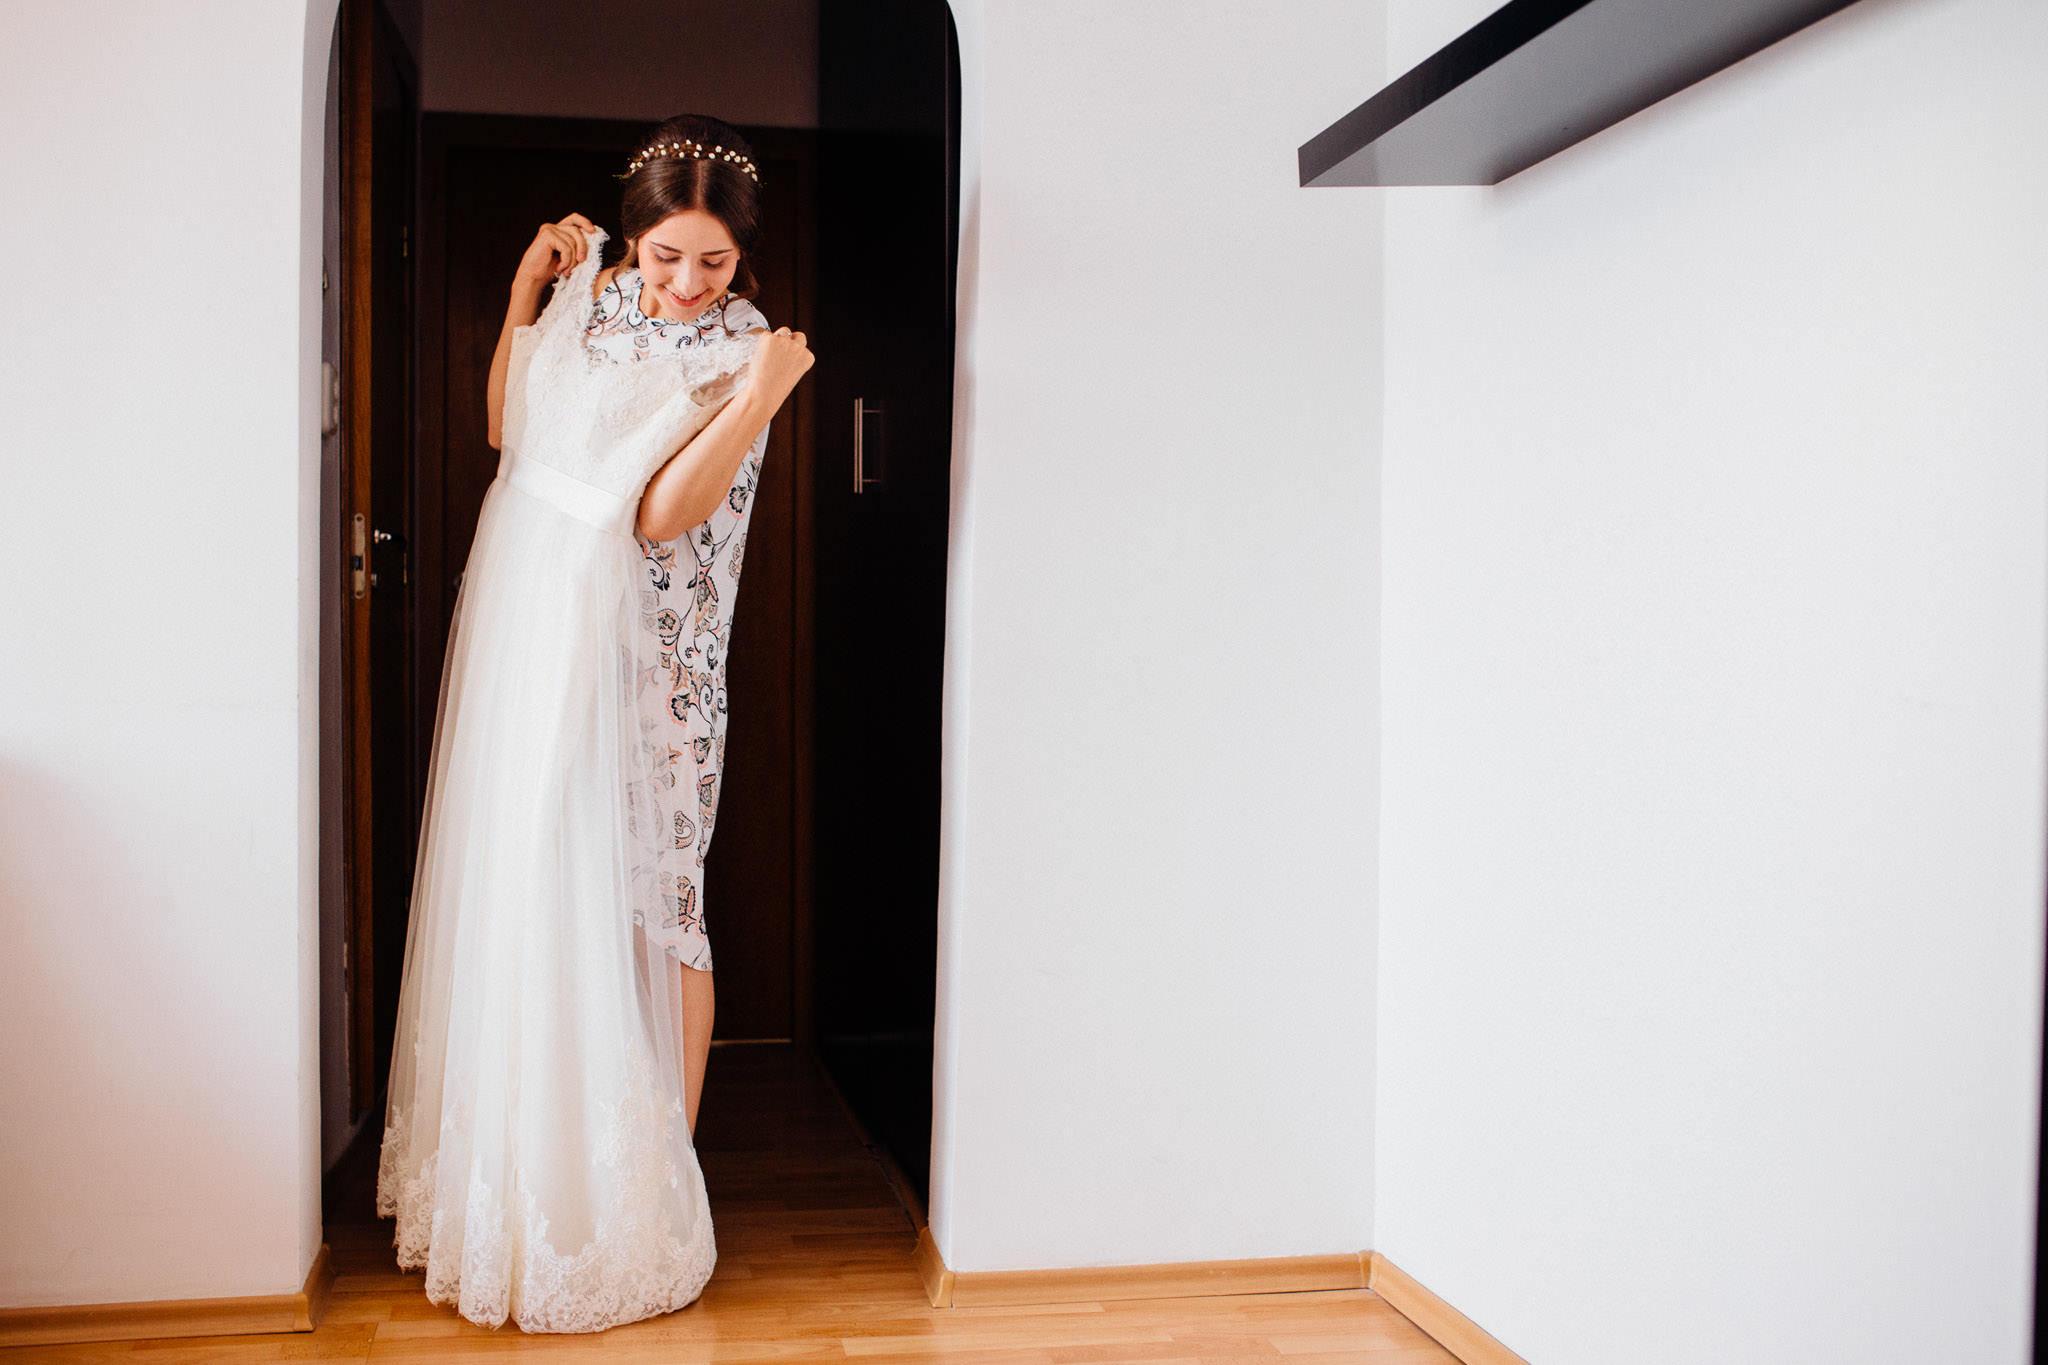 Beniamin & Ana fotograf nunta vintage Bucuresti-1028